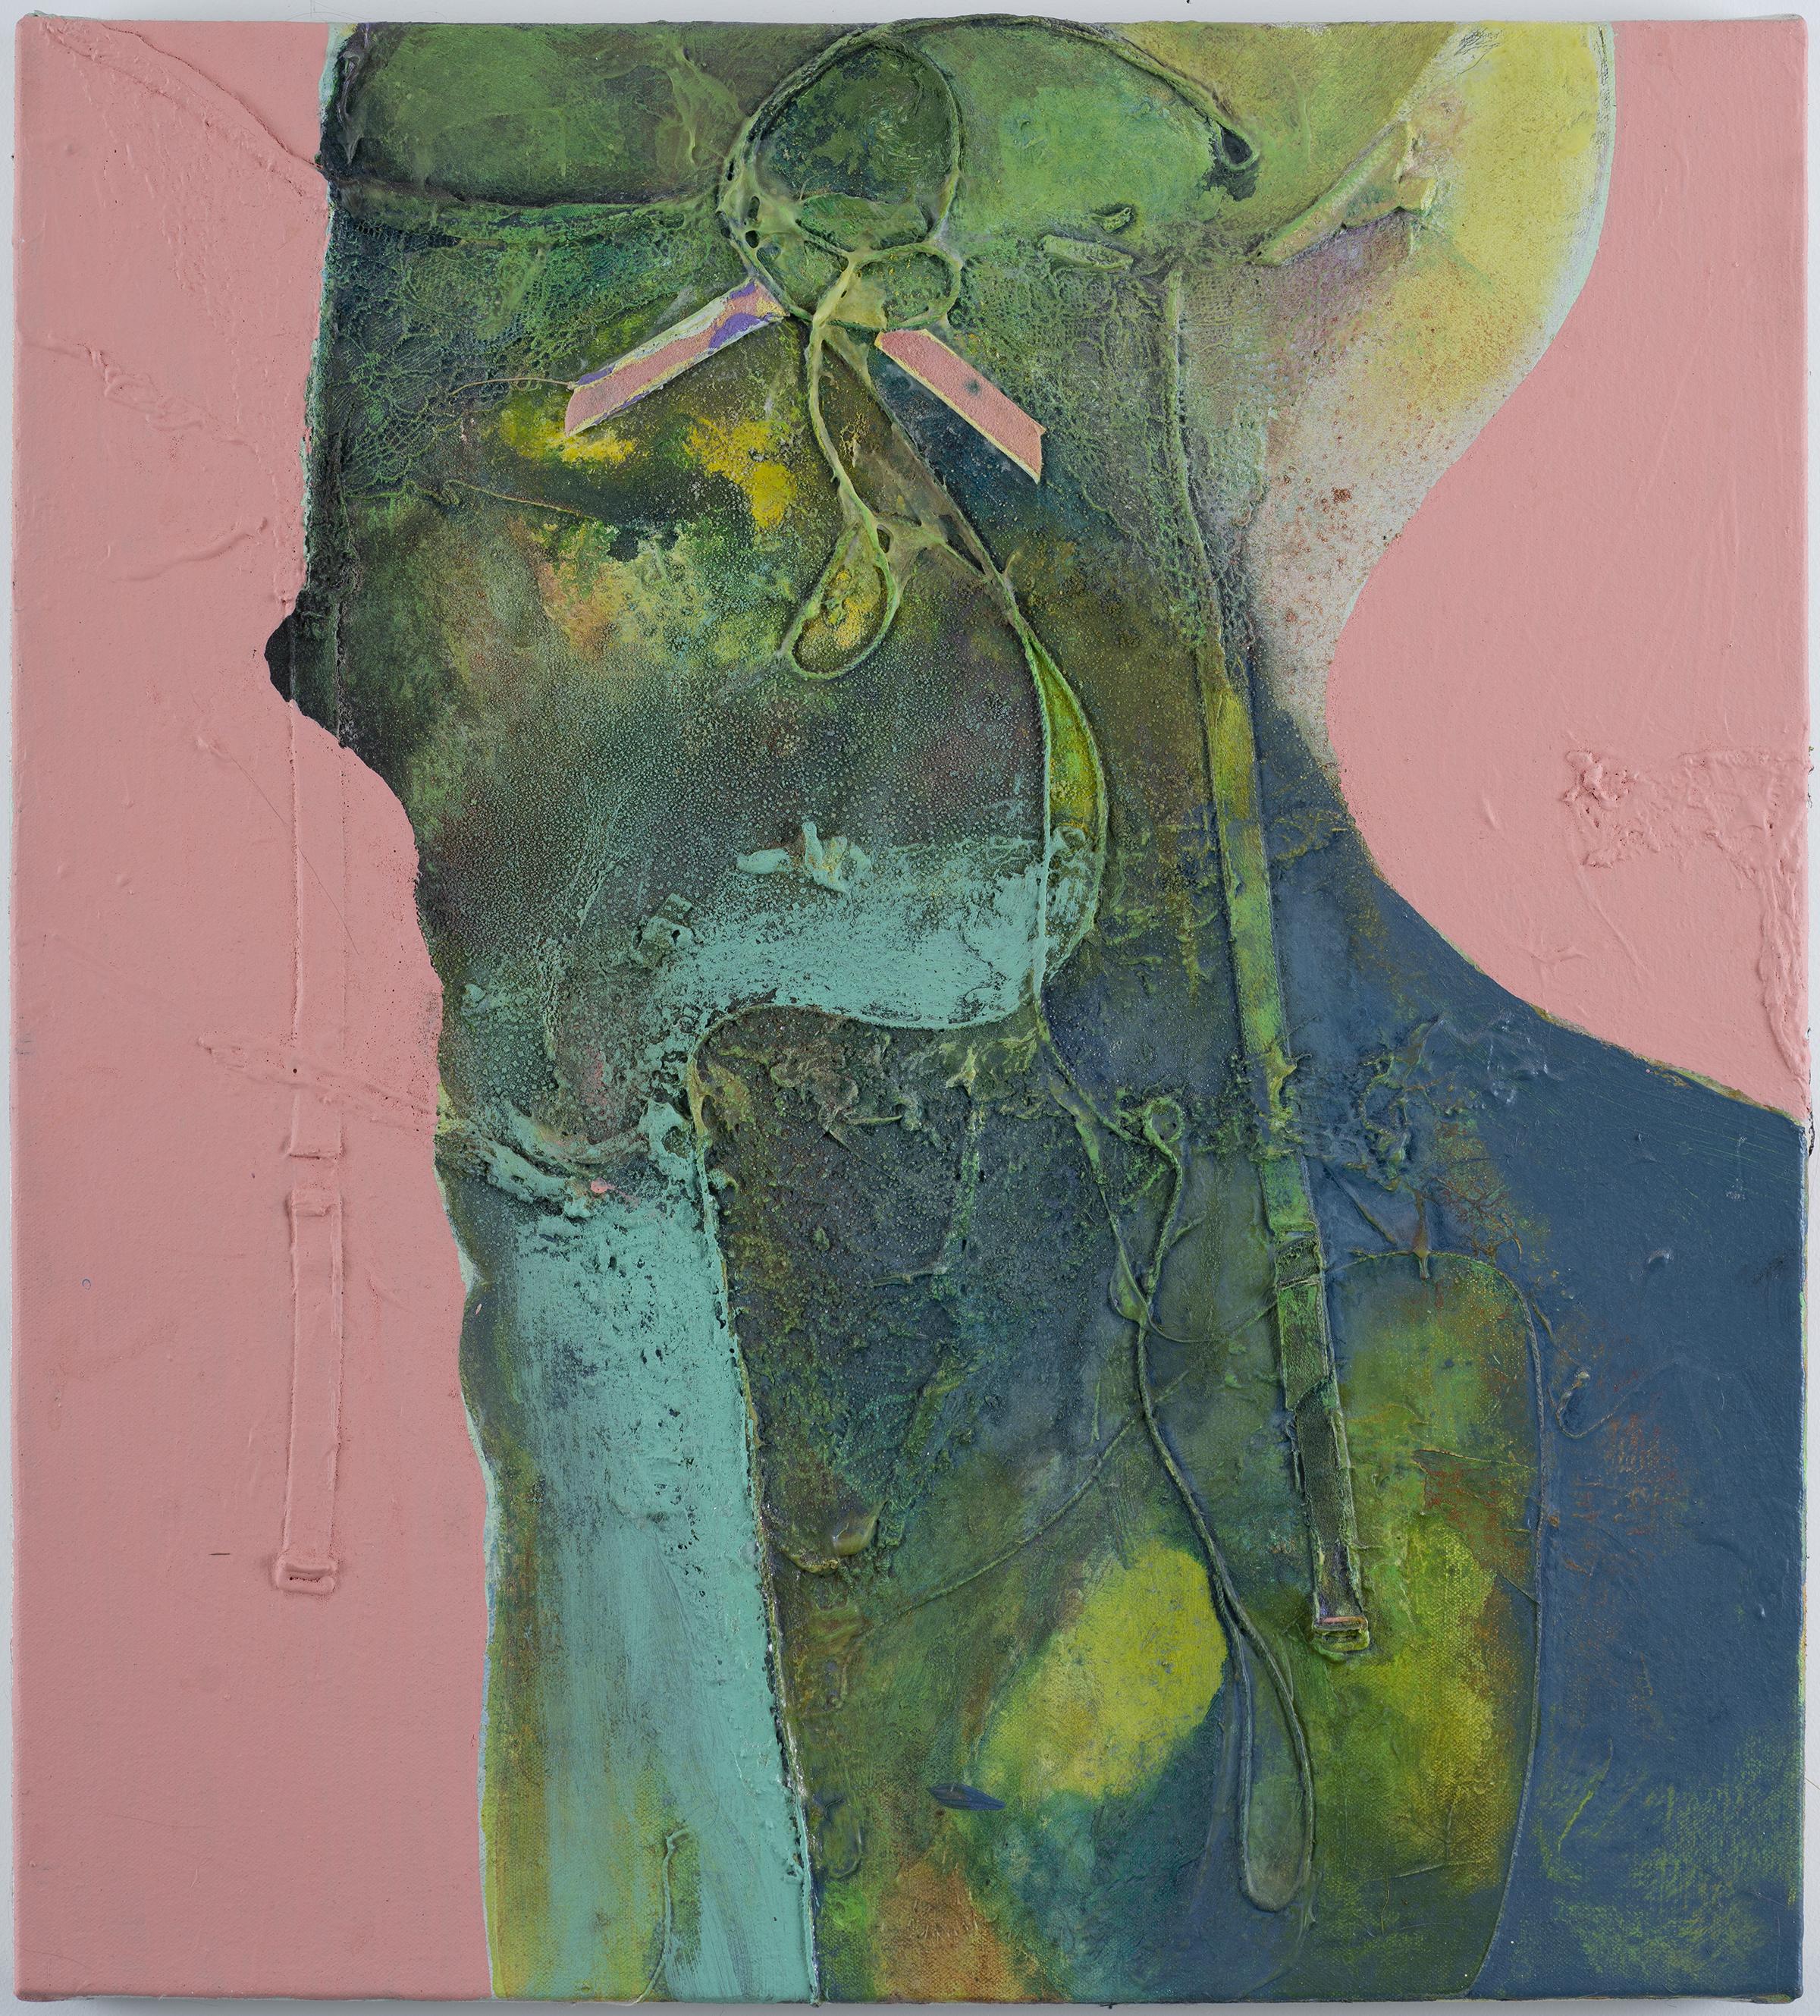 "M. Page Greene, Pink Ribbon, 2016, acrylic with nylon, hemp, salt and paper on canvas. 22"" x 20"""